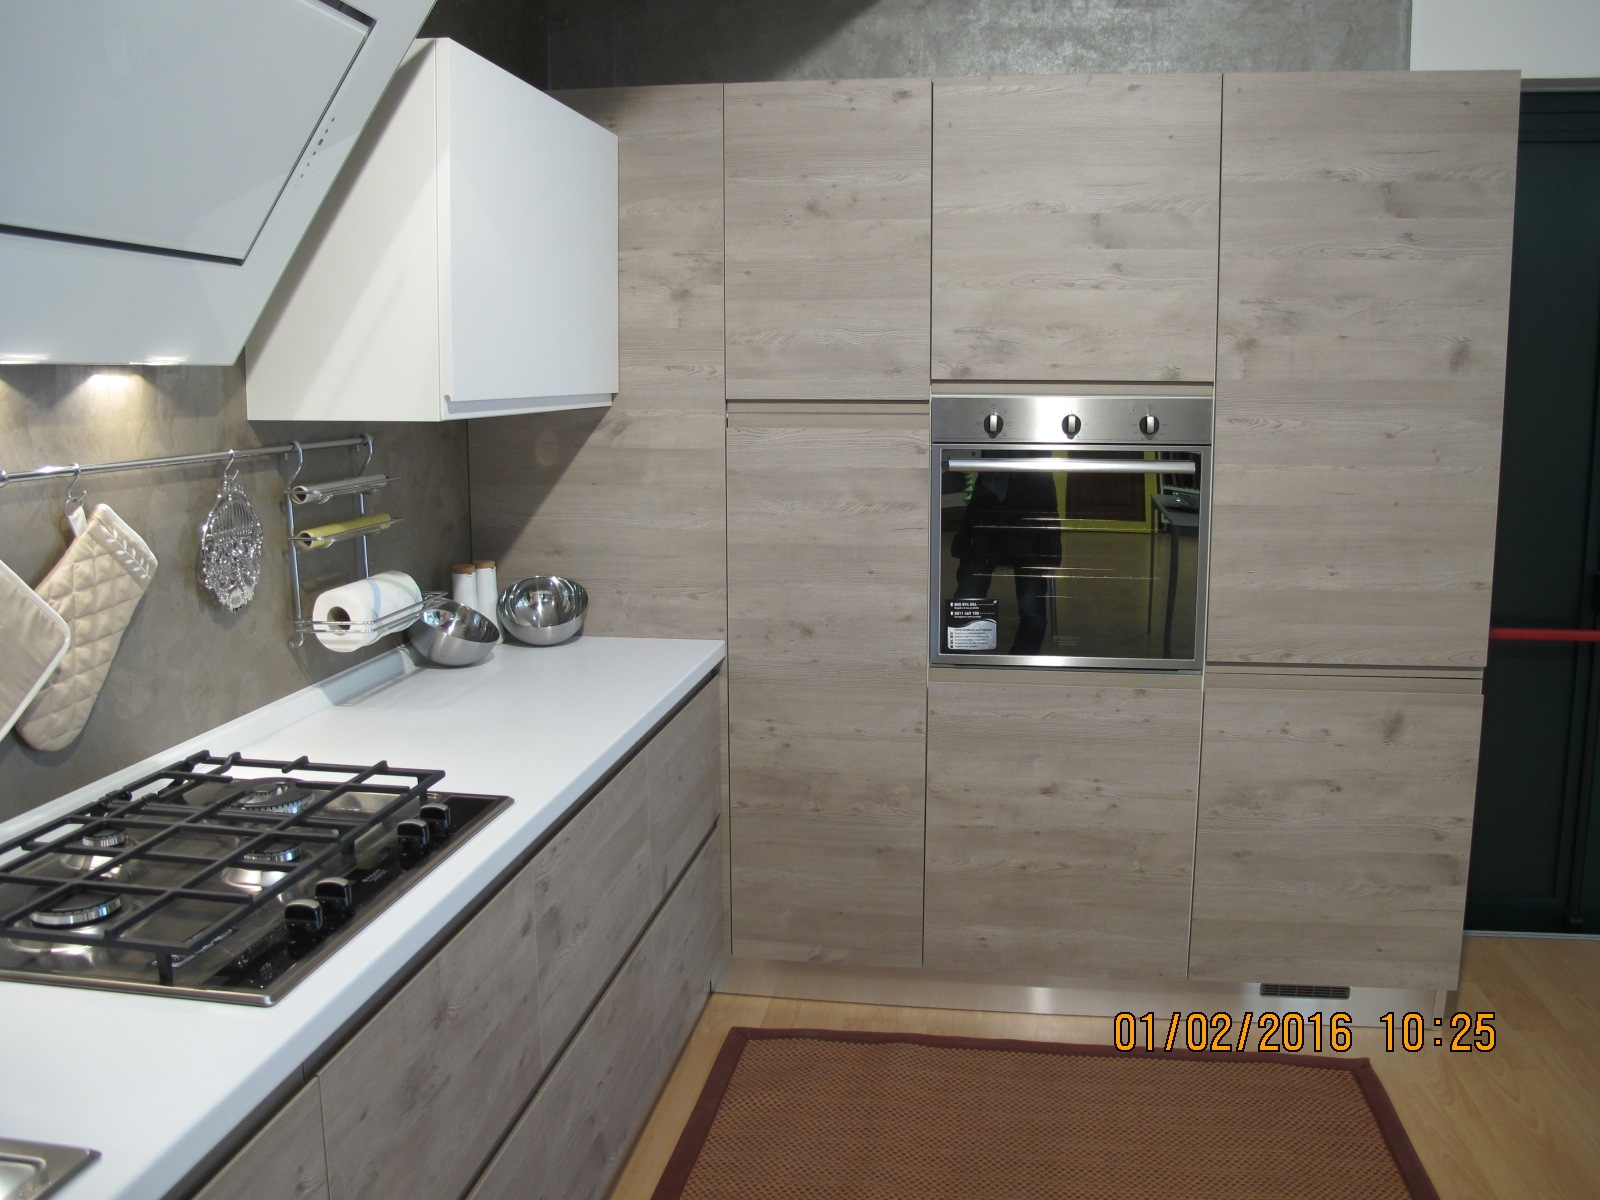 Cucina Ad Angolo. Cucina Ad Angolo With Cucina Ad Angolo ...